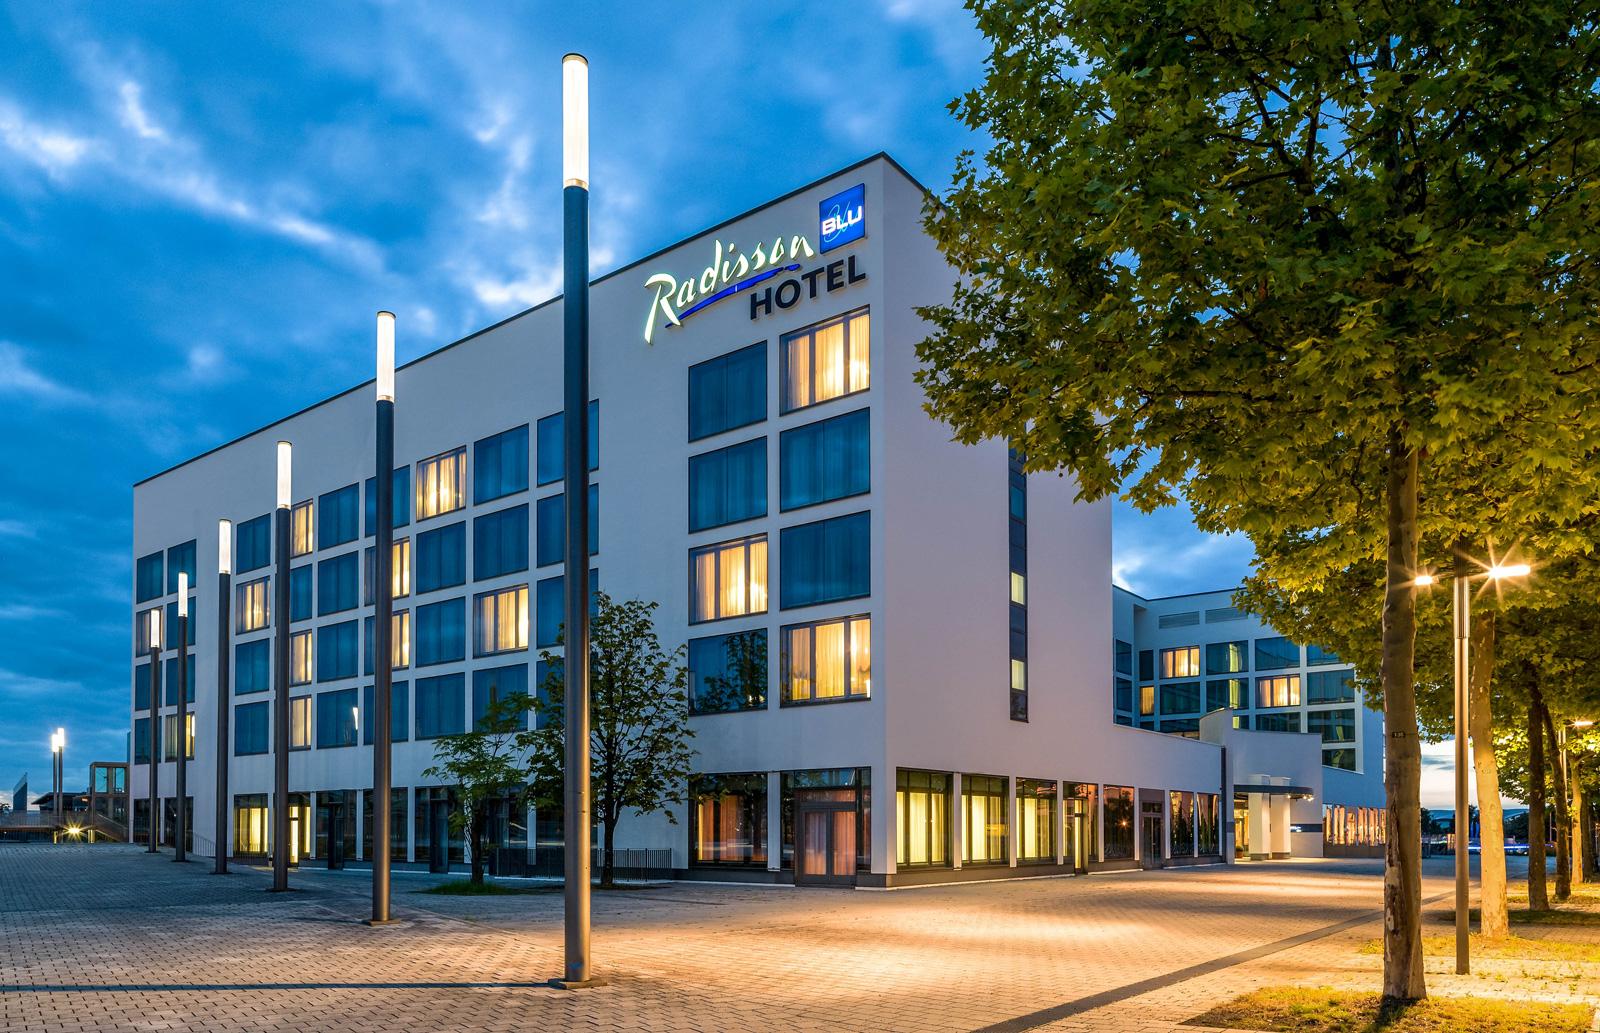 seminarhotel tagungshotel in hannover radisson blu hotel hannover konferenzhotel. Black Bedroom Furniture Sets. Home Design Ideas